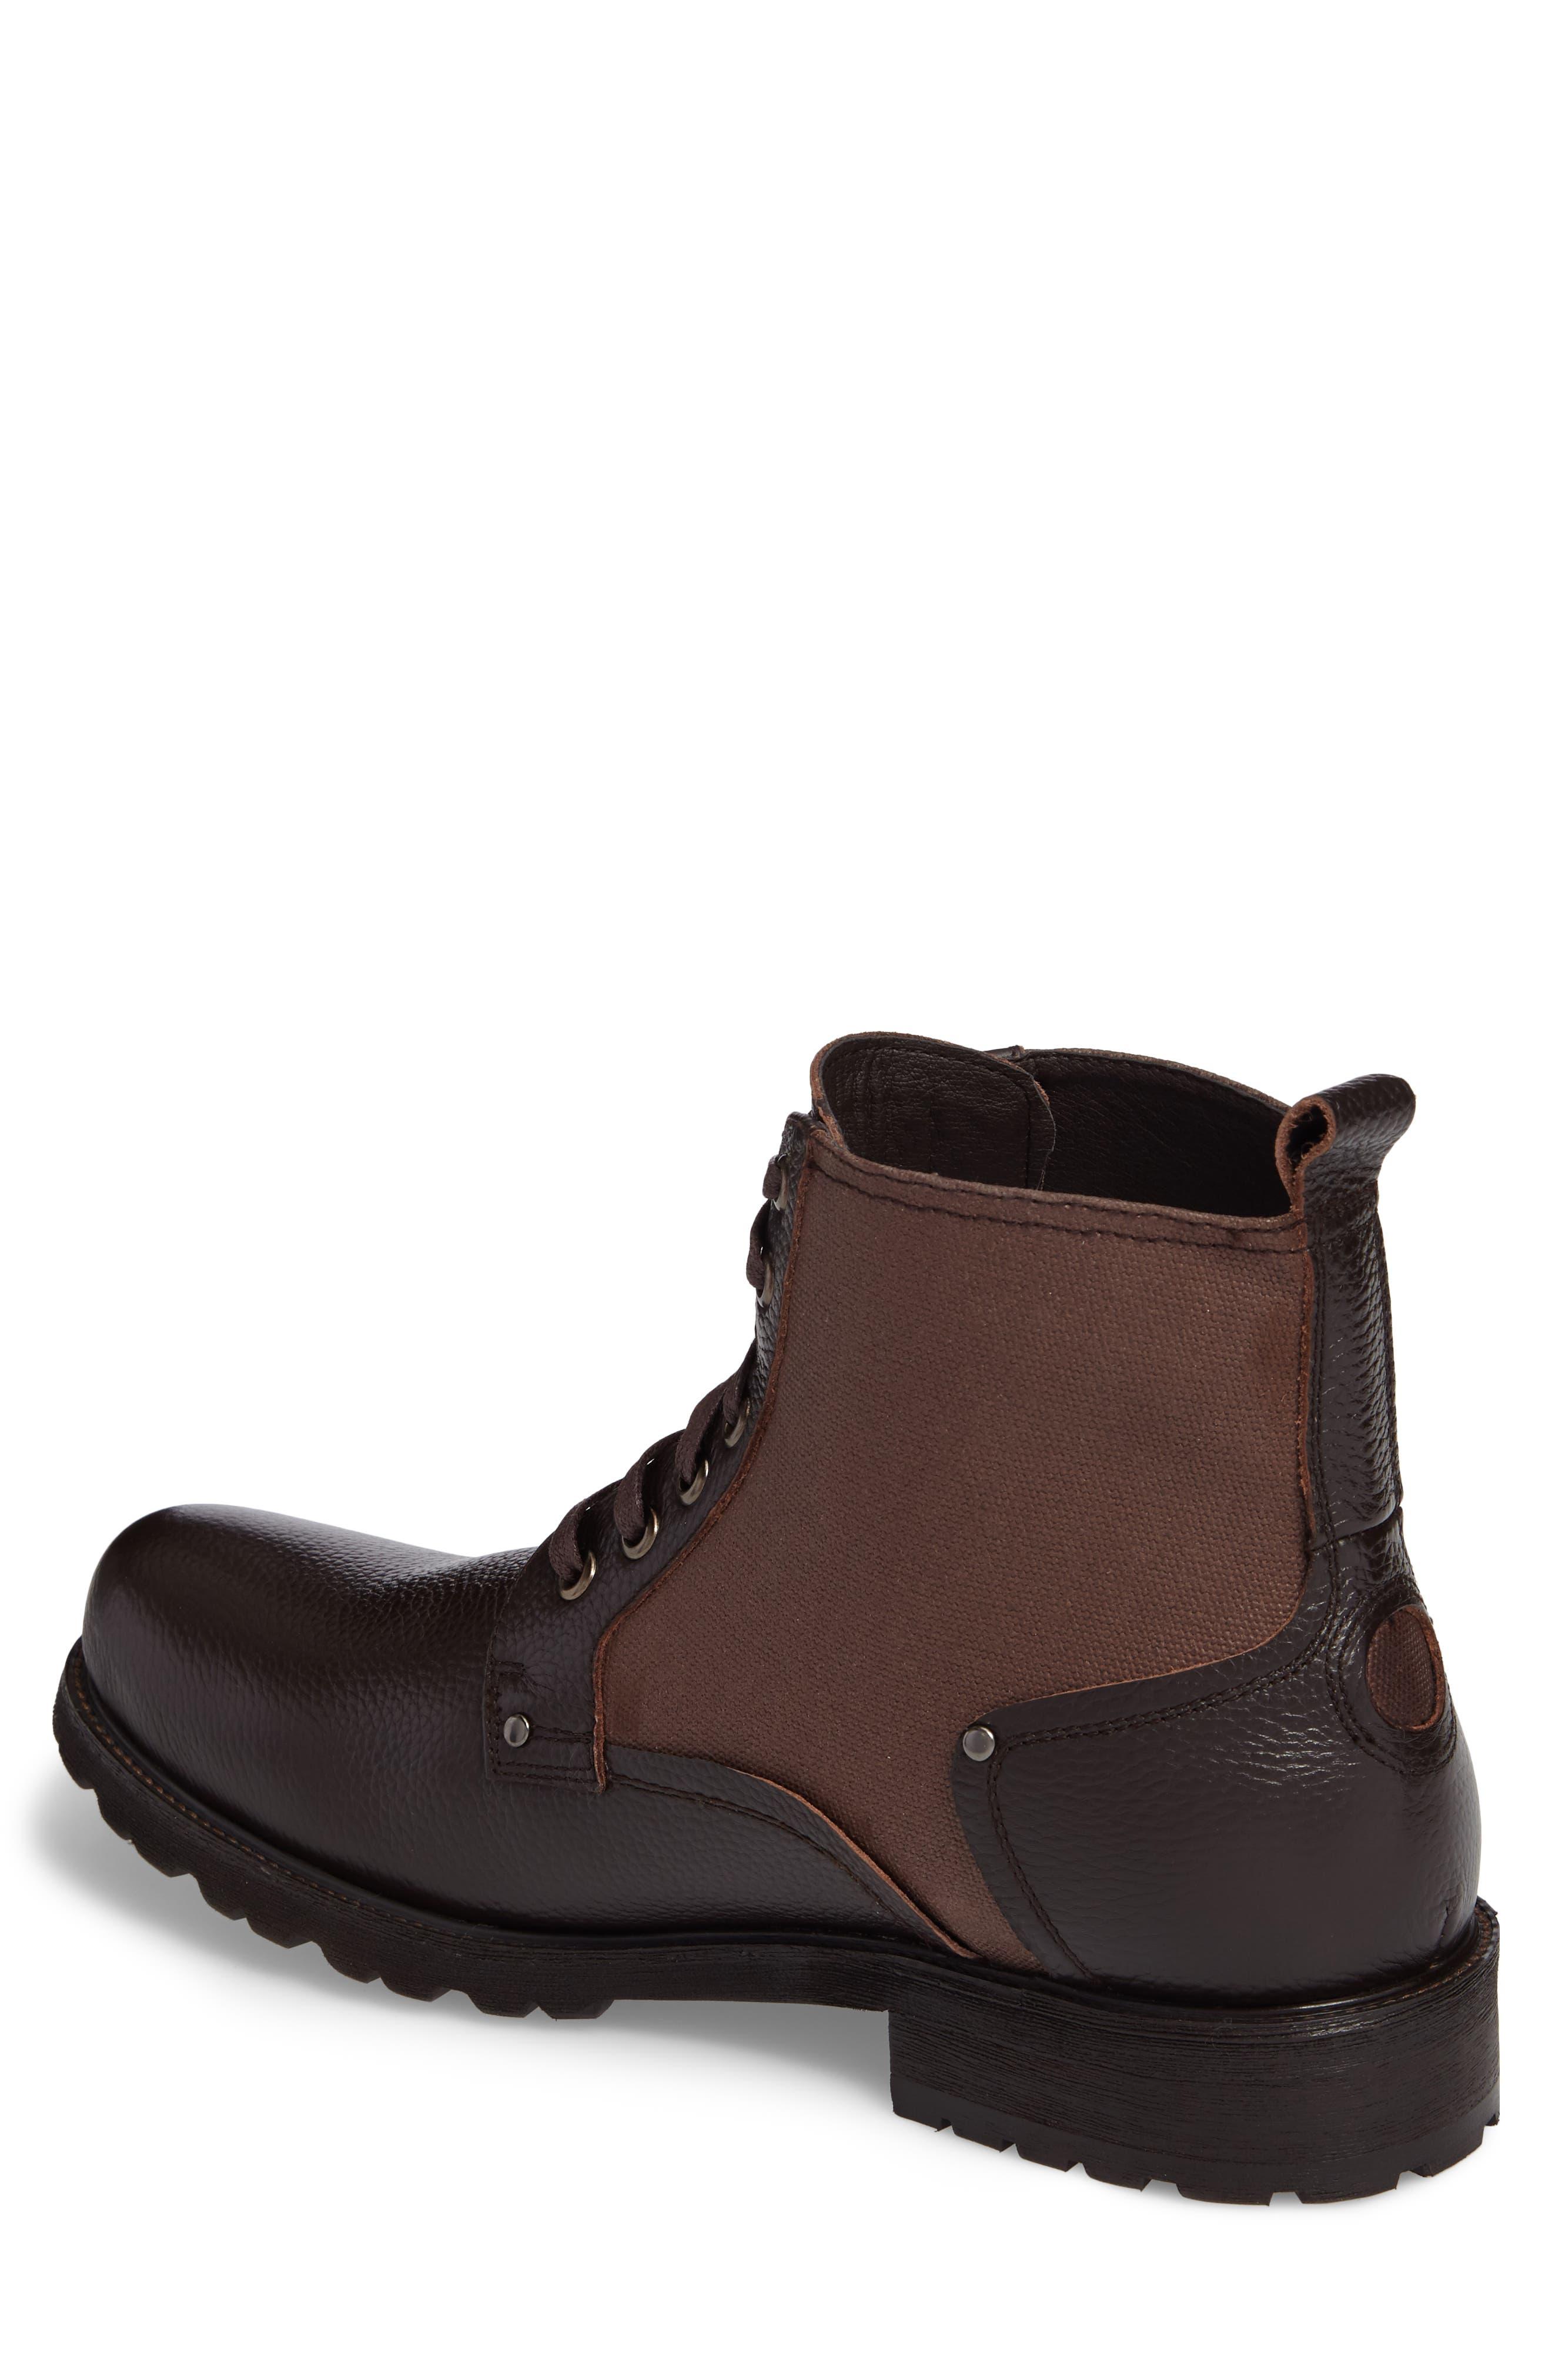 Whitley Plain Toe Boot,                             Alternate thumbnail 4, color,